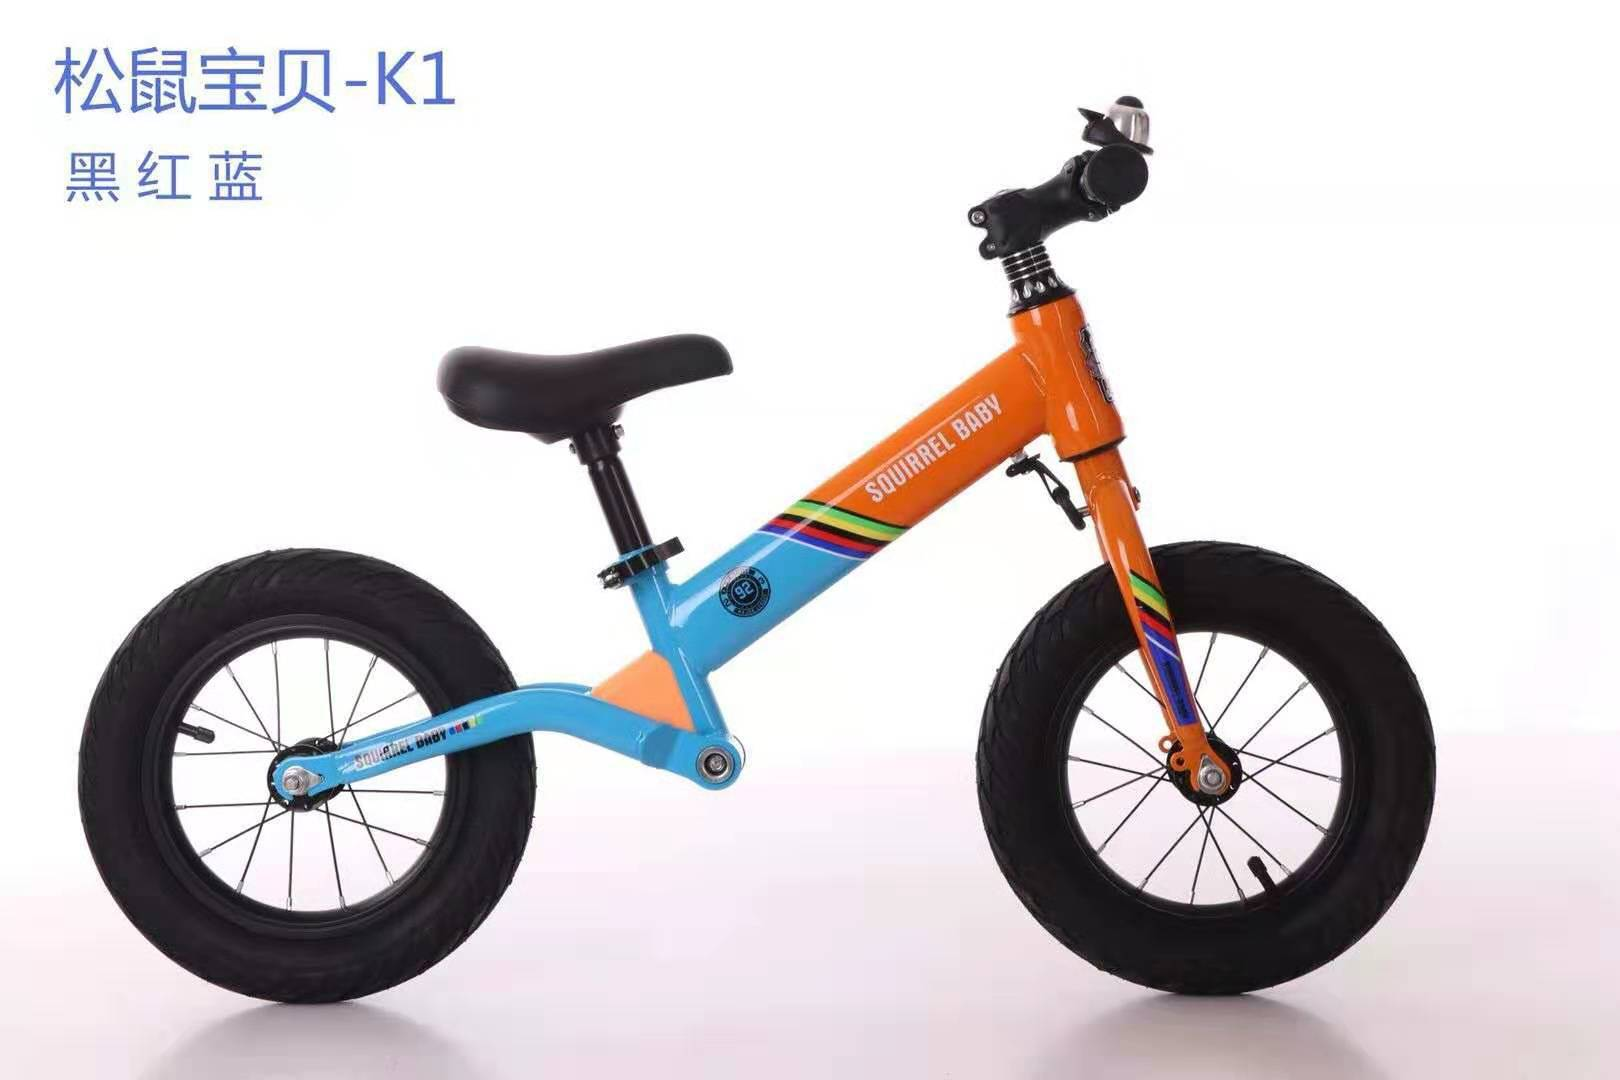 HTB1CR9QelGE3KVjSZFhq6AkaFXa8 Children balance bike without pedal slide baby damper sliding kids bicycle self balance scooters racing